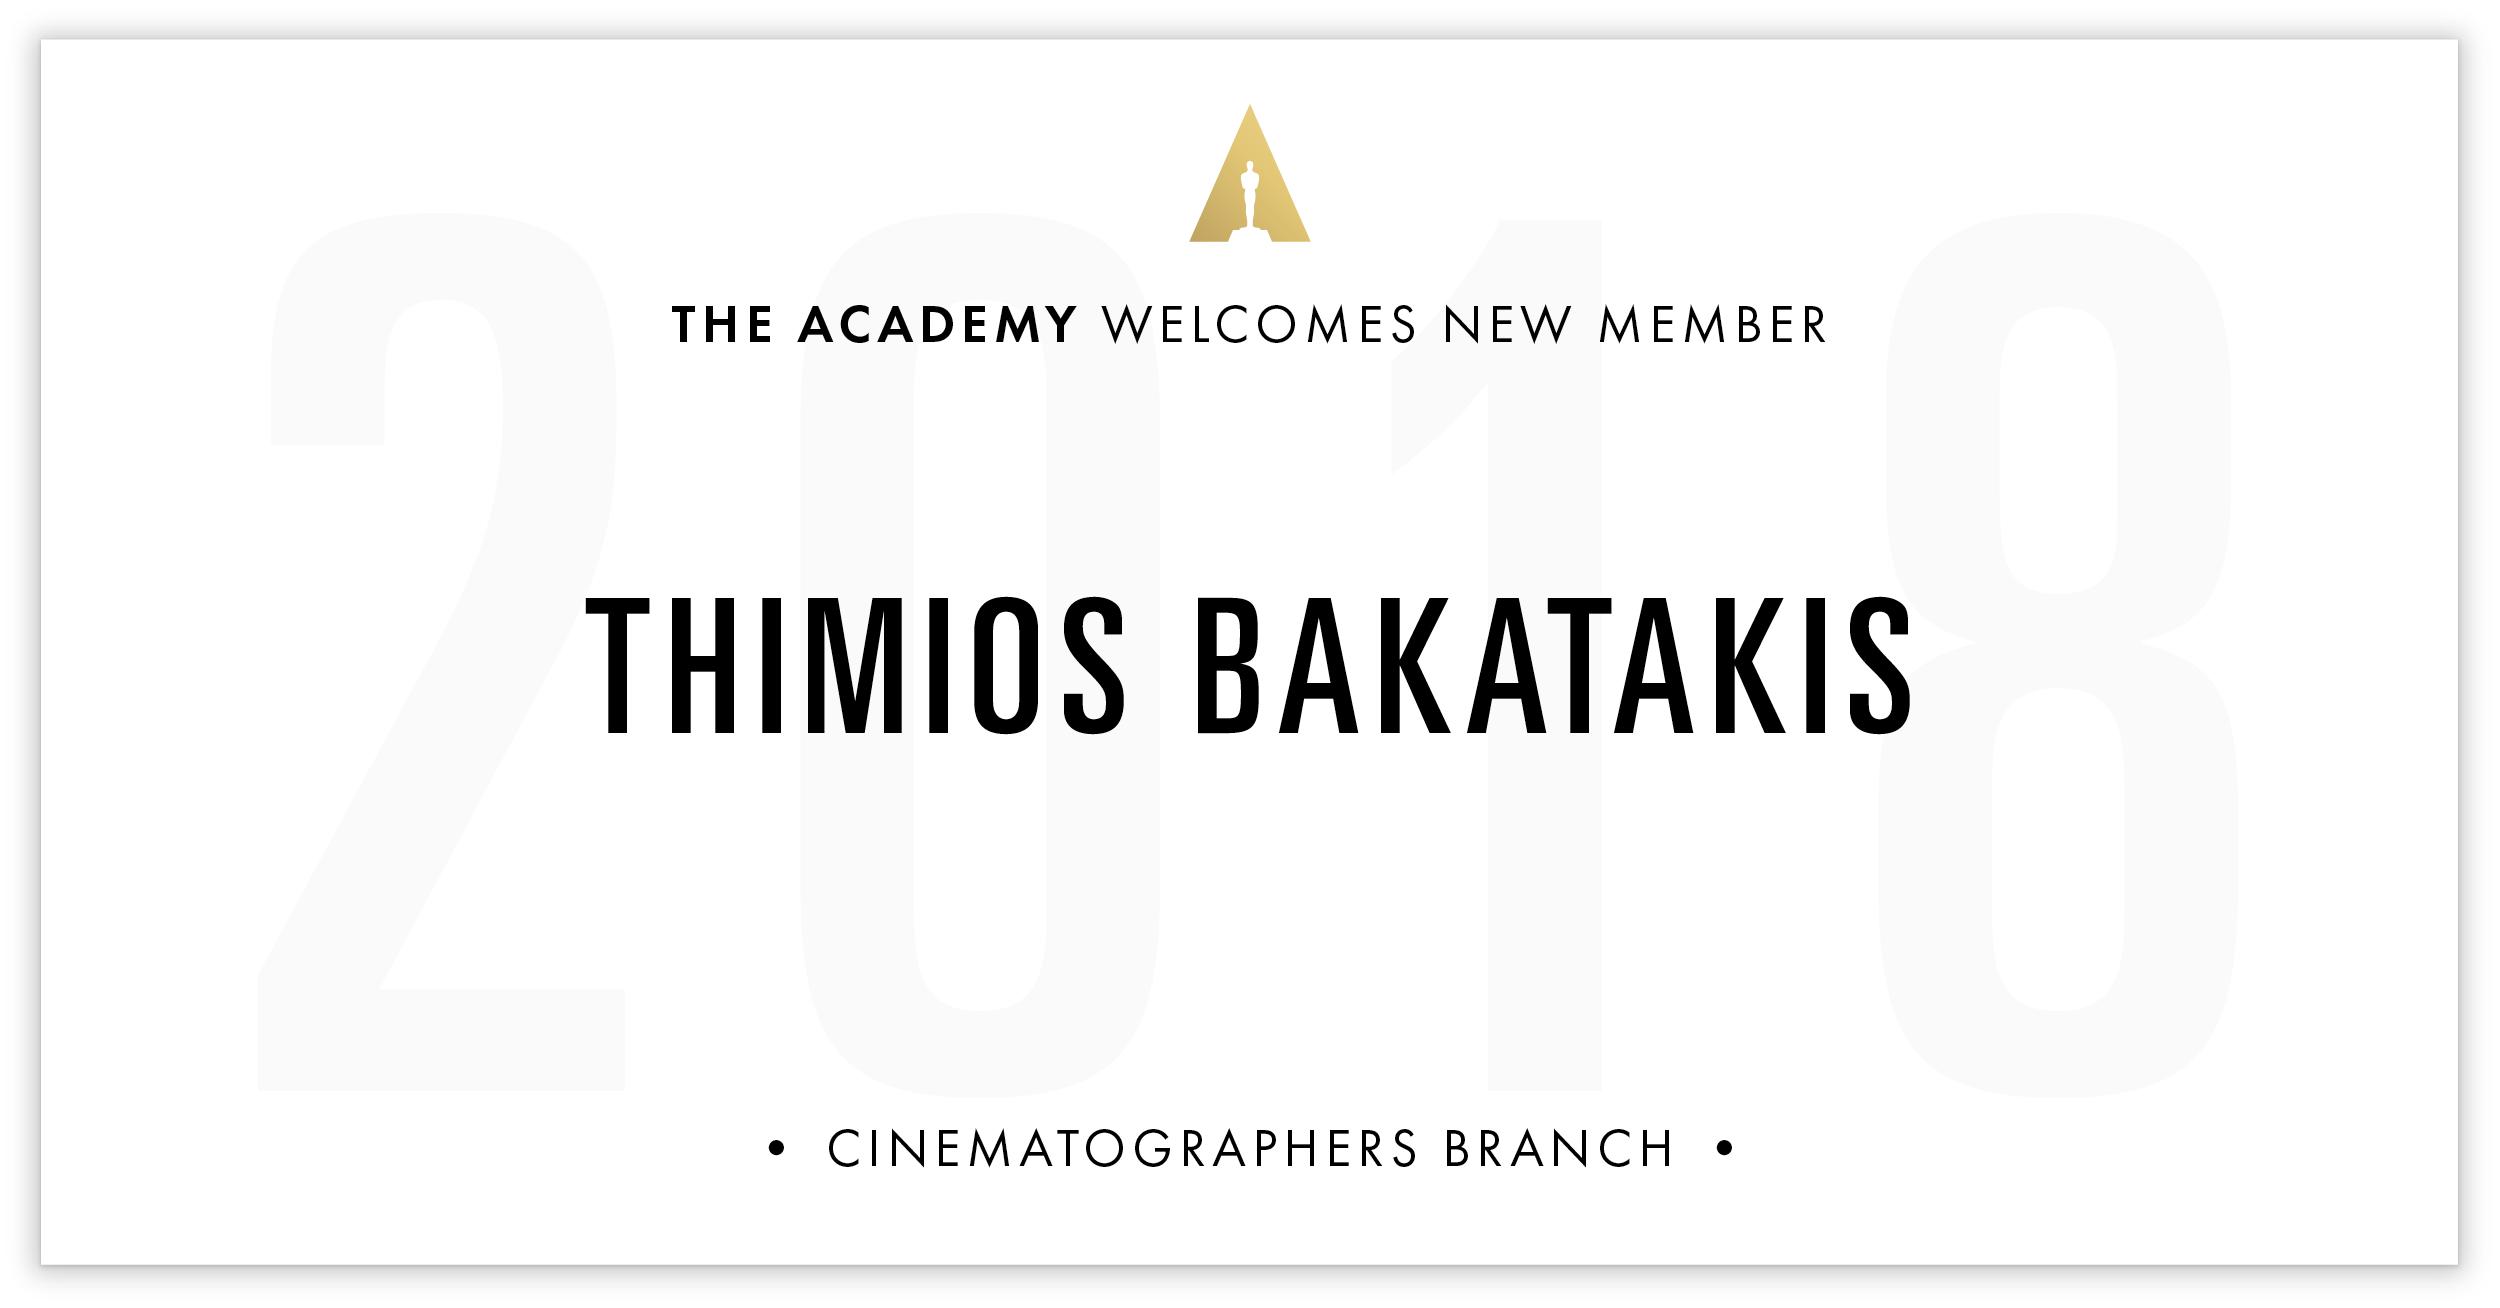 Thimios Bakatakis is invited!